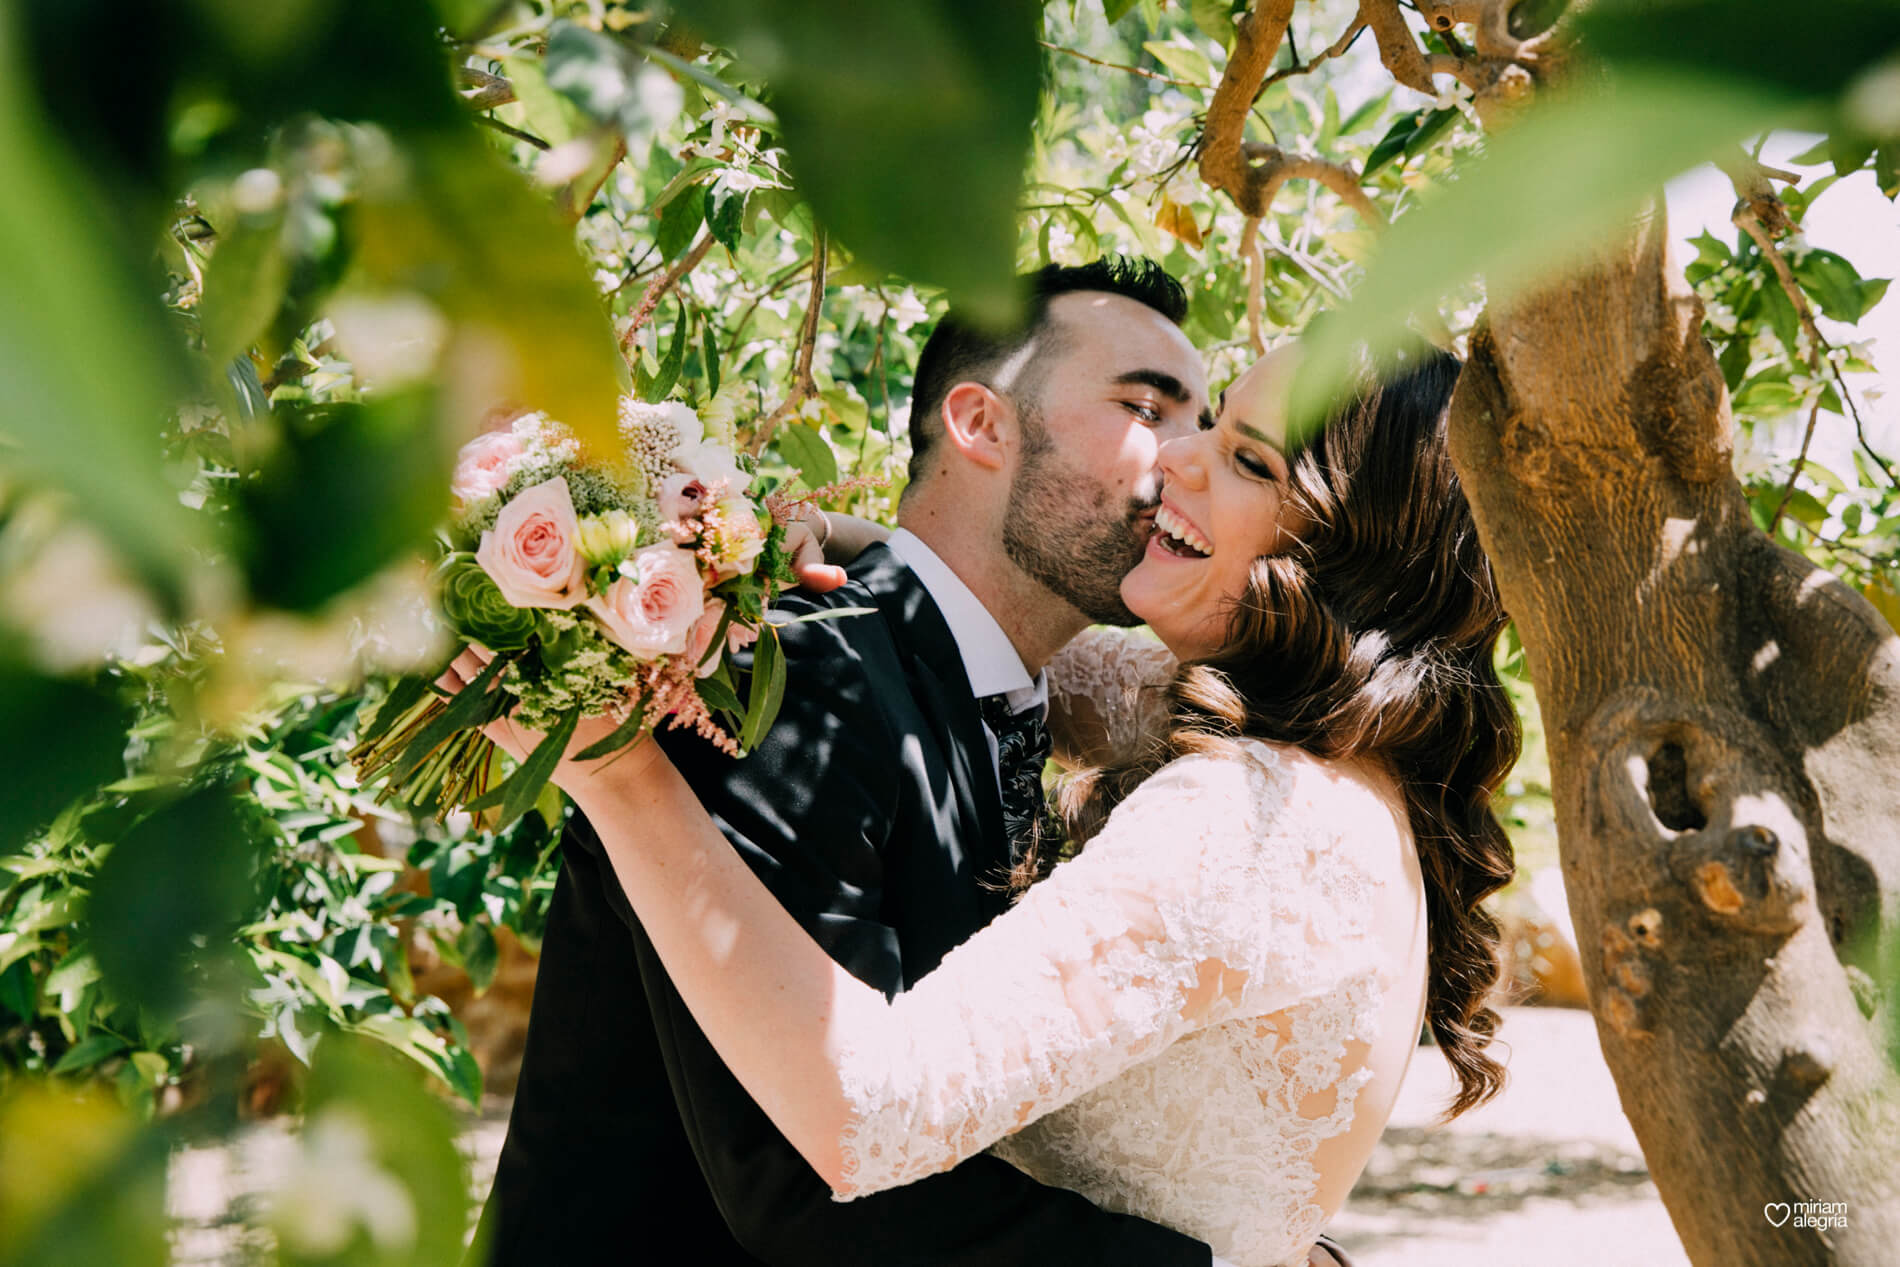 boda-en-finca-jurosa-miriam-alegria-95